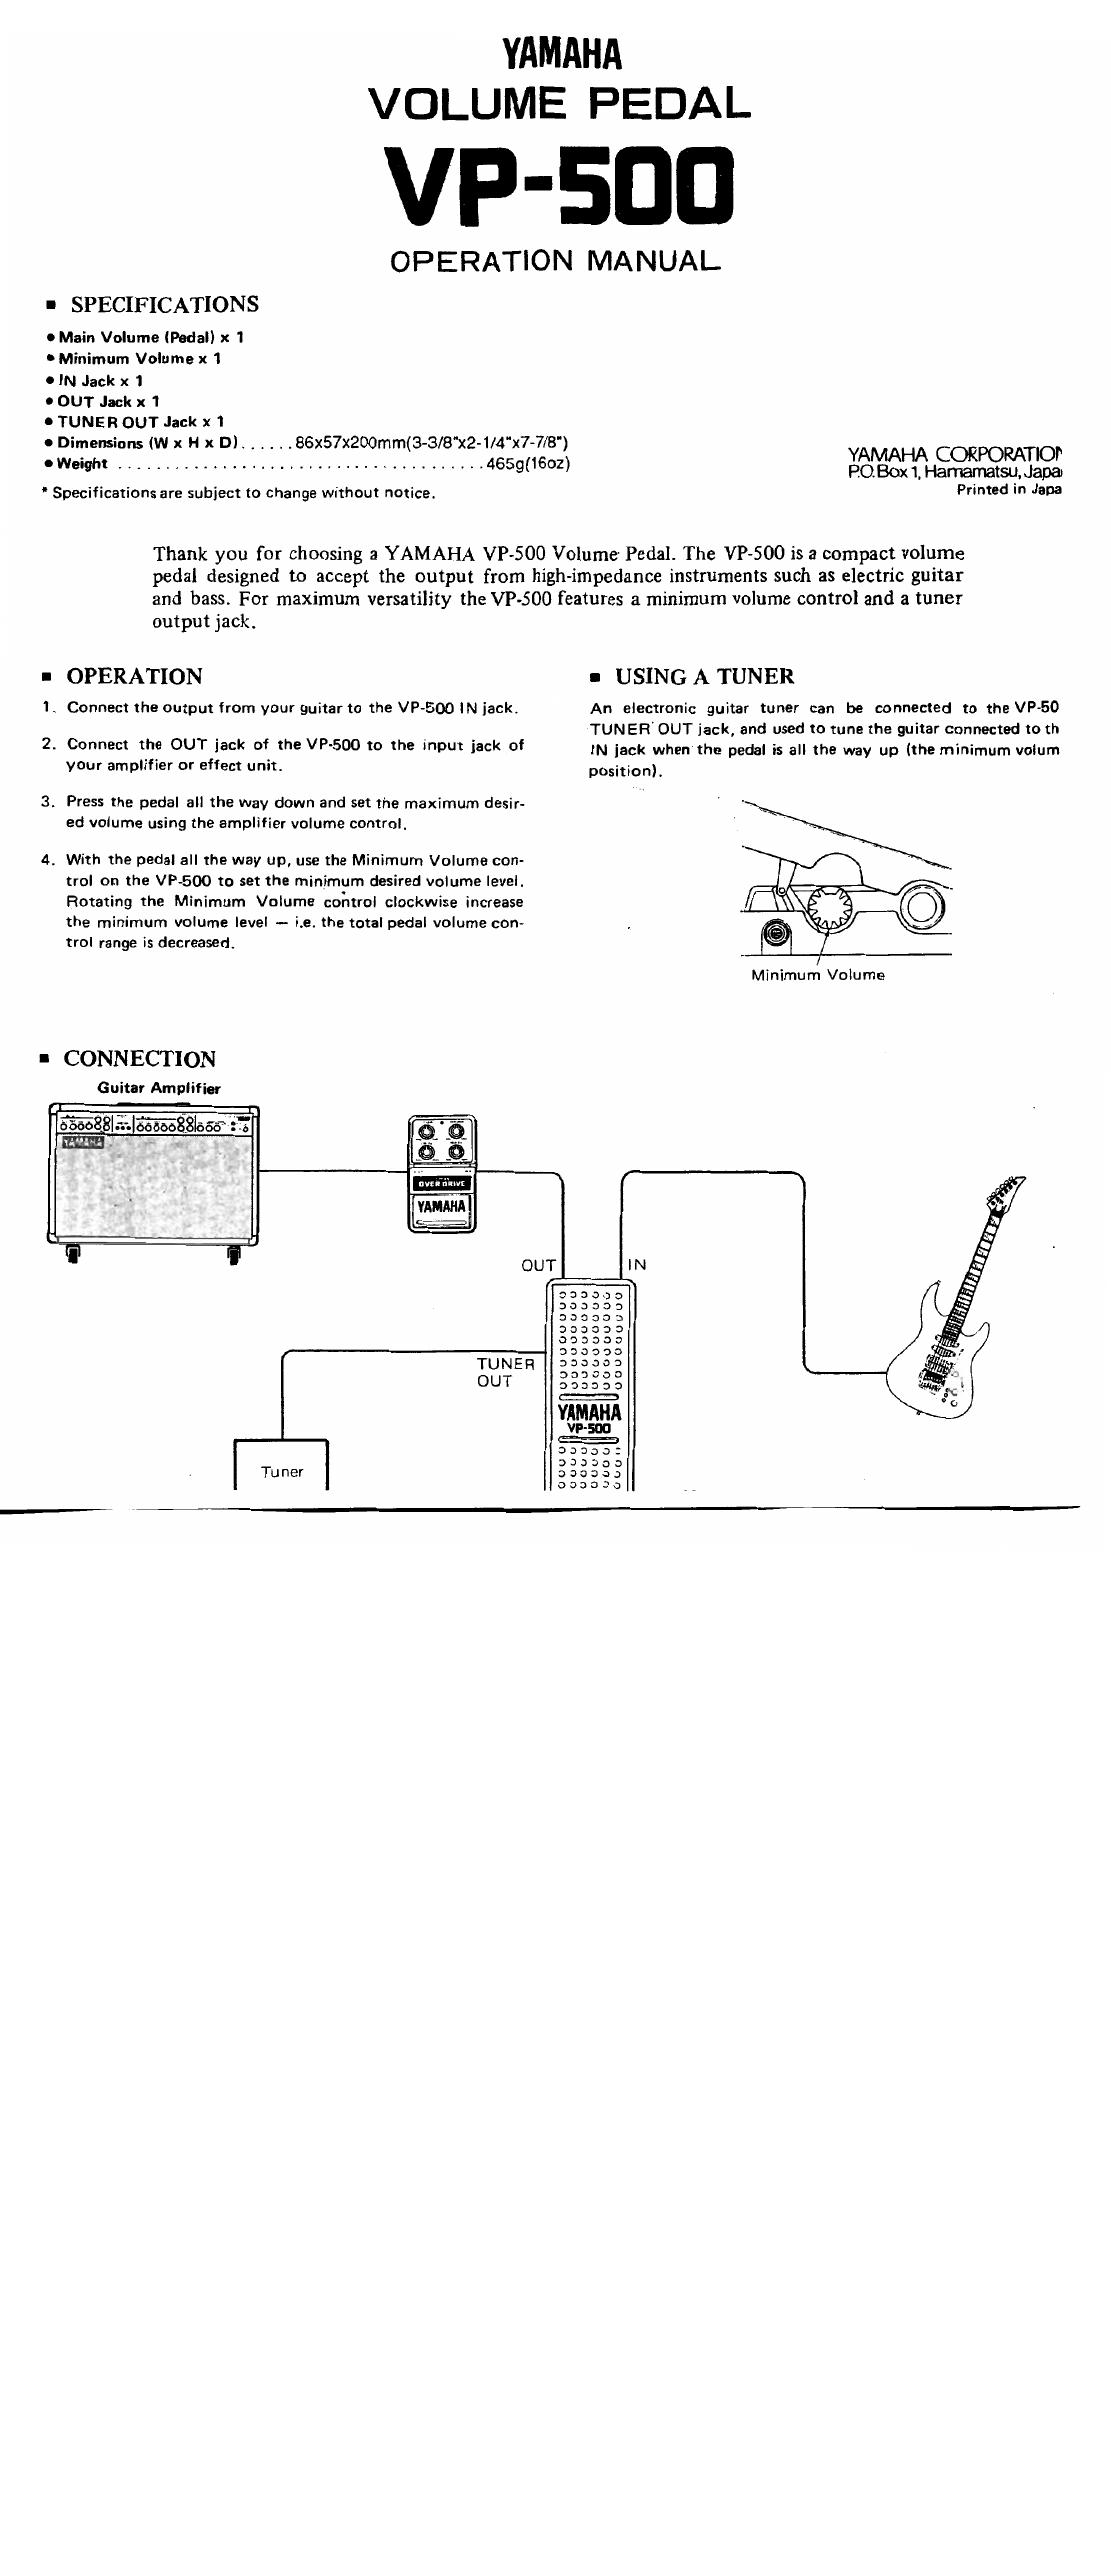 Yamaha Vp 500 User Manual Manualzz